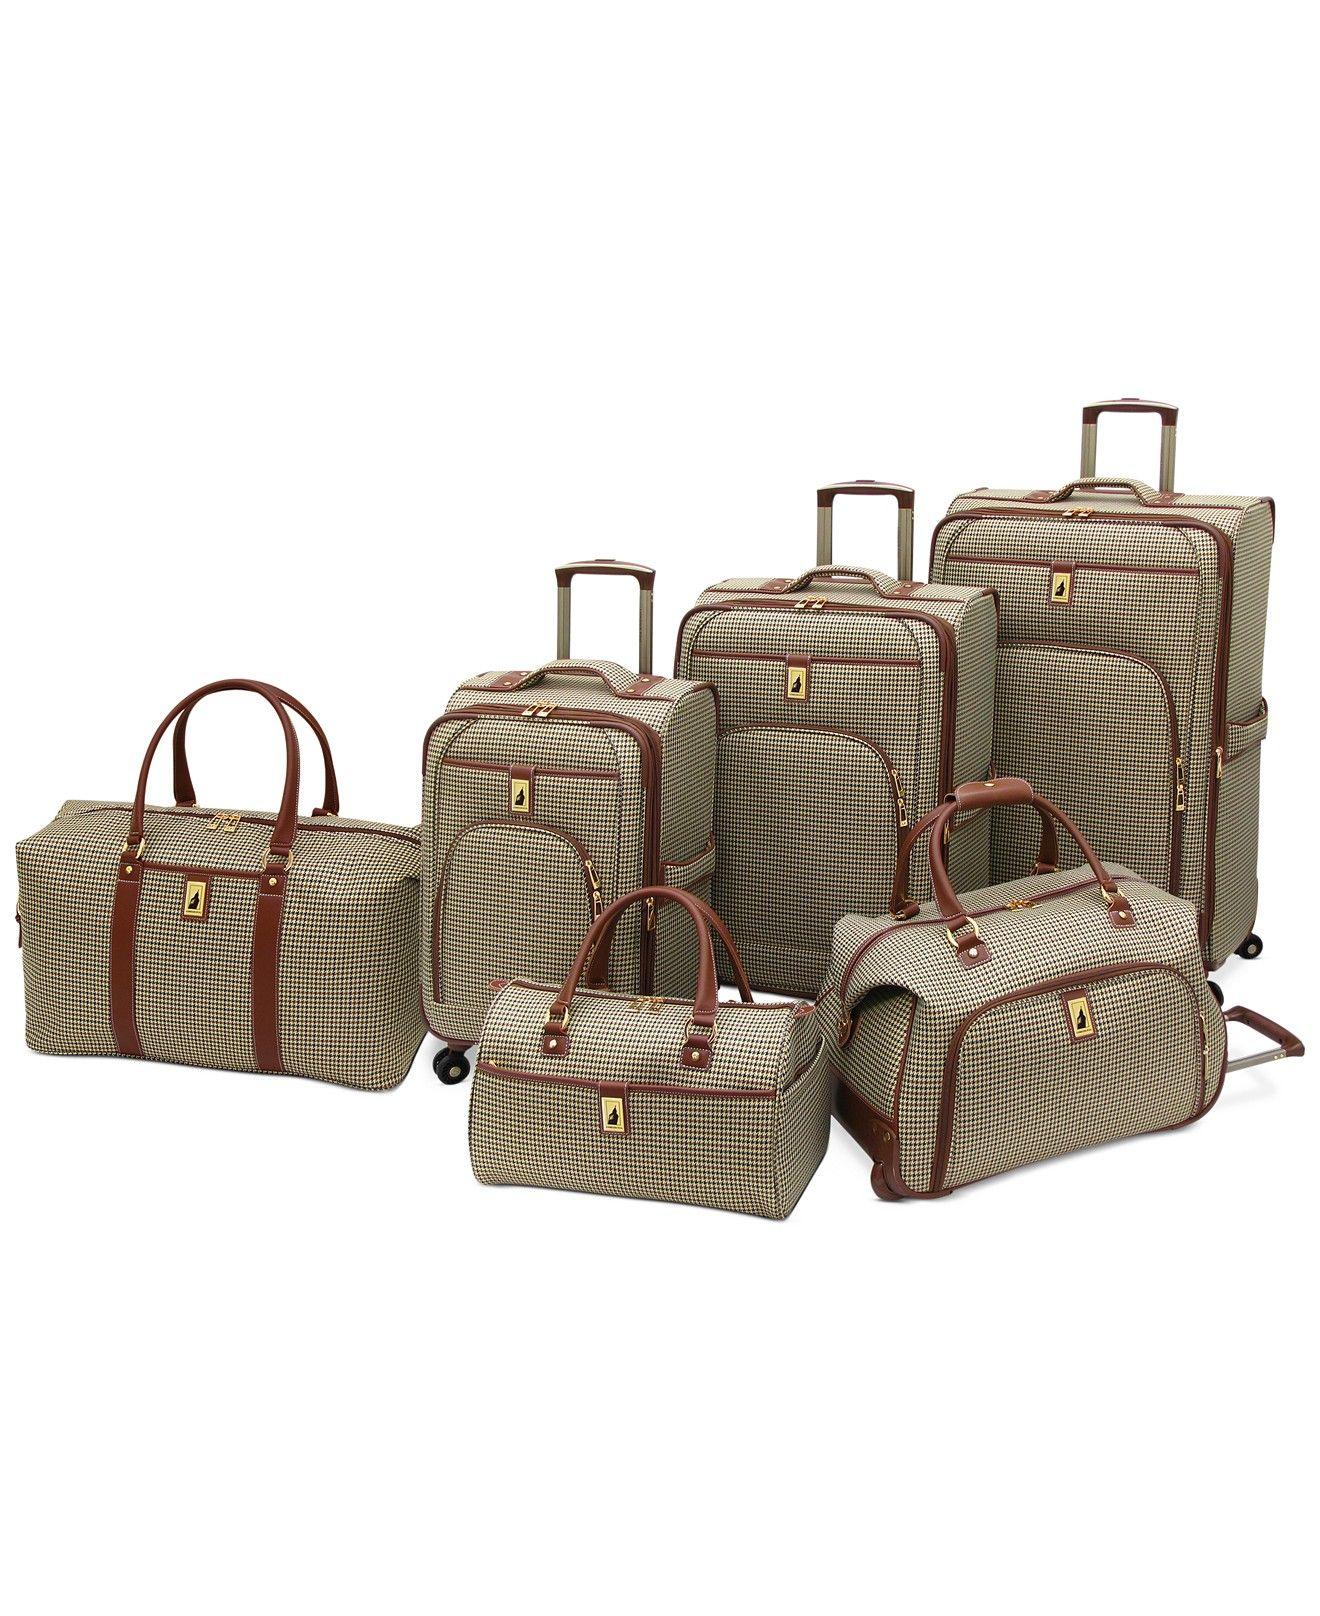 91d500e76e London Fog Cambridge Spinner Luggage - London Fog - luggage   backpacks -  Macy s